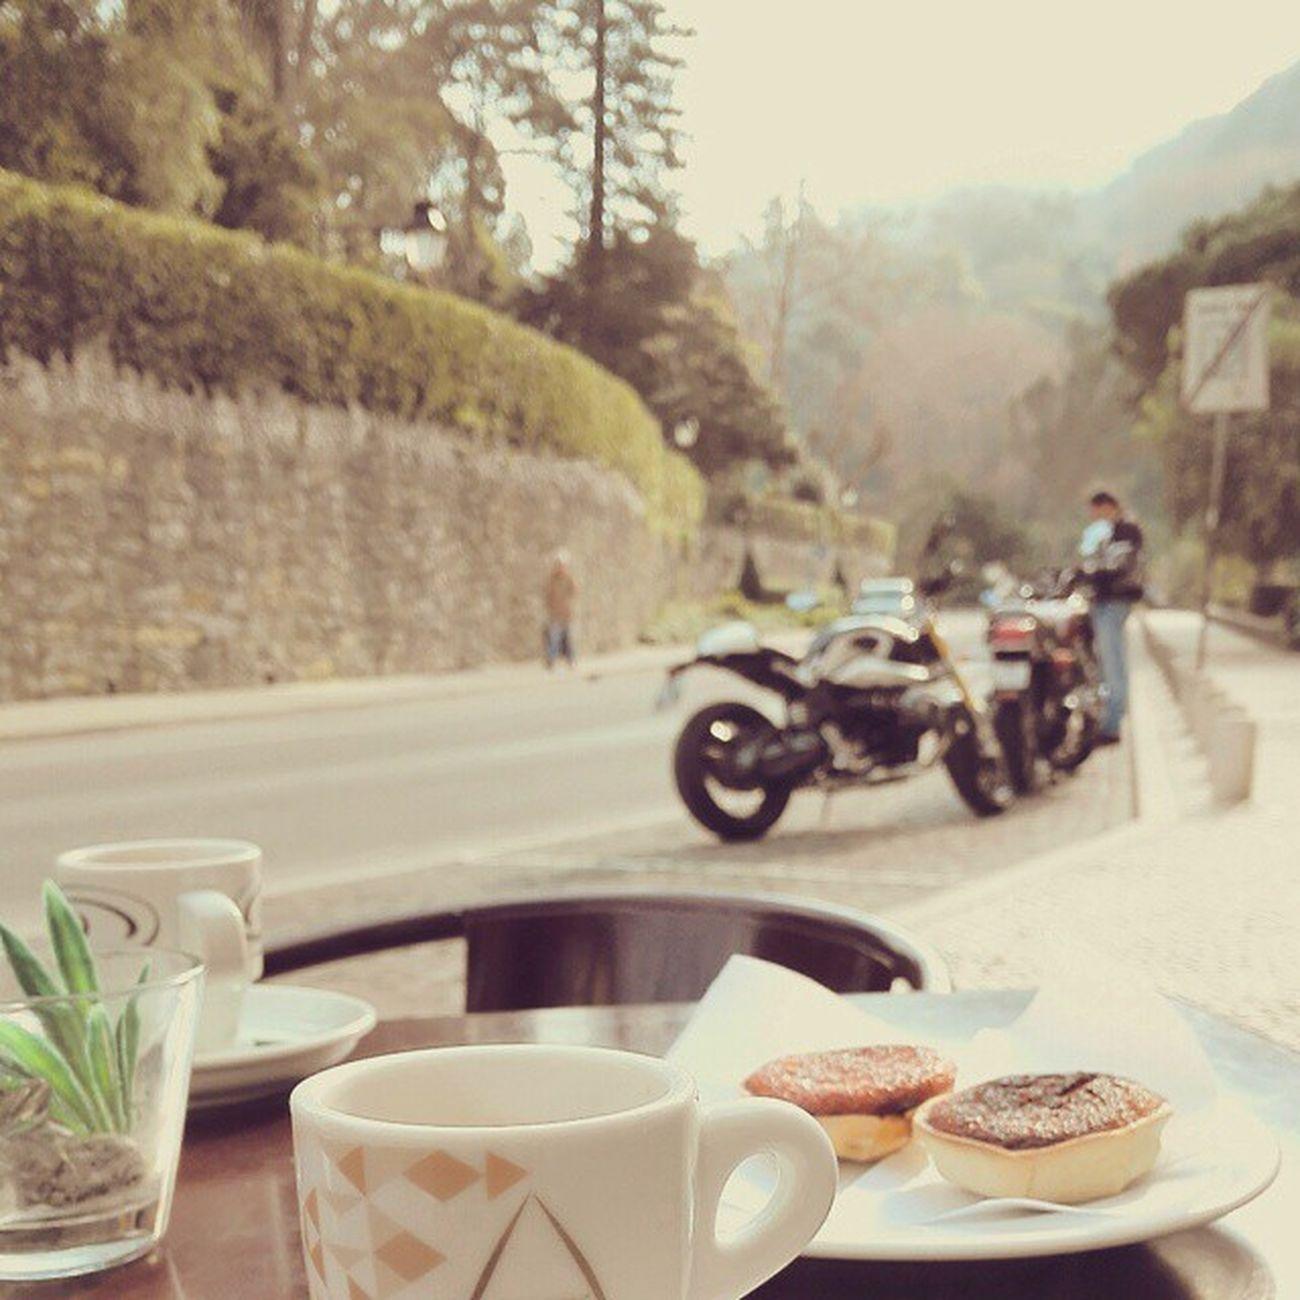 QueijadasdaSapa P3top Sintra Caferacer Ninet Rninet R9t Dropmoto